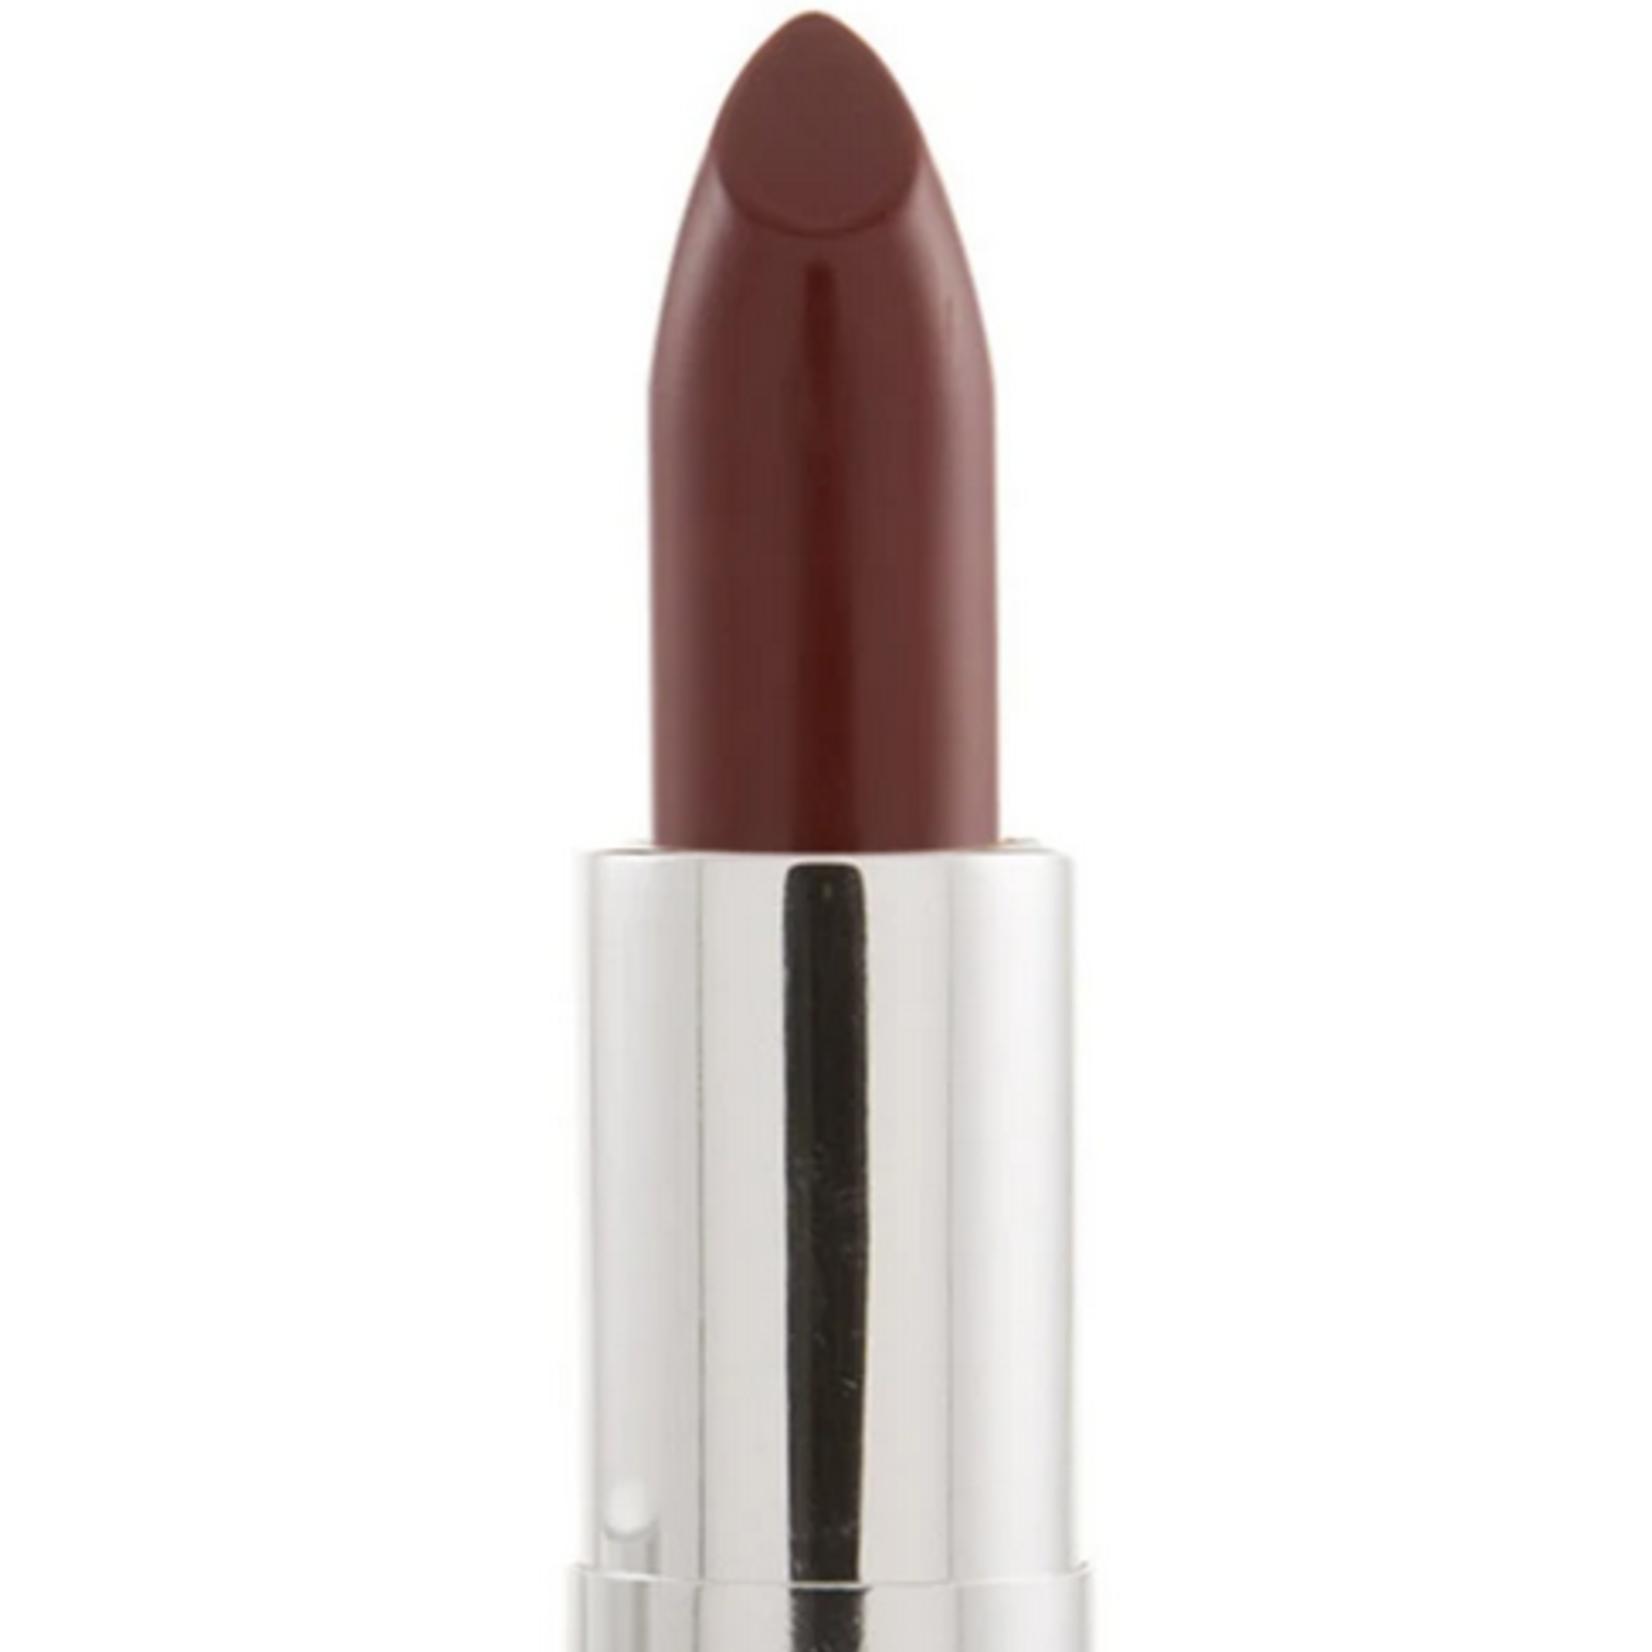 Ben Nye Ben Nye LS-8 Cranberry Lipstick